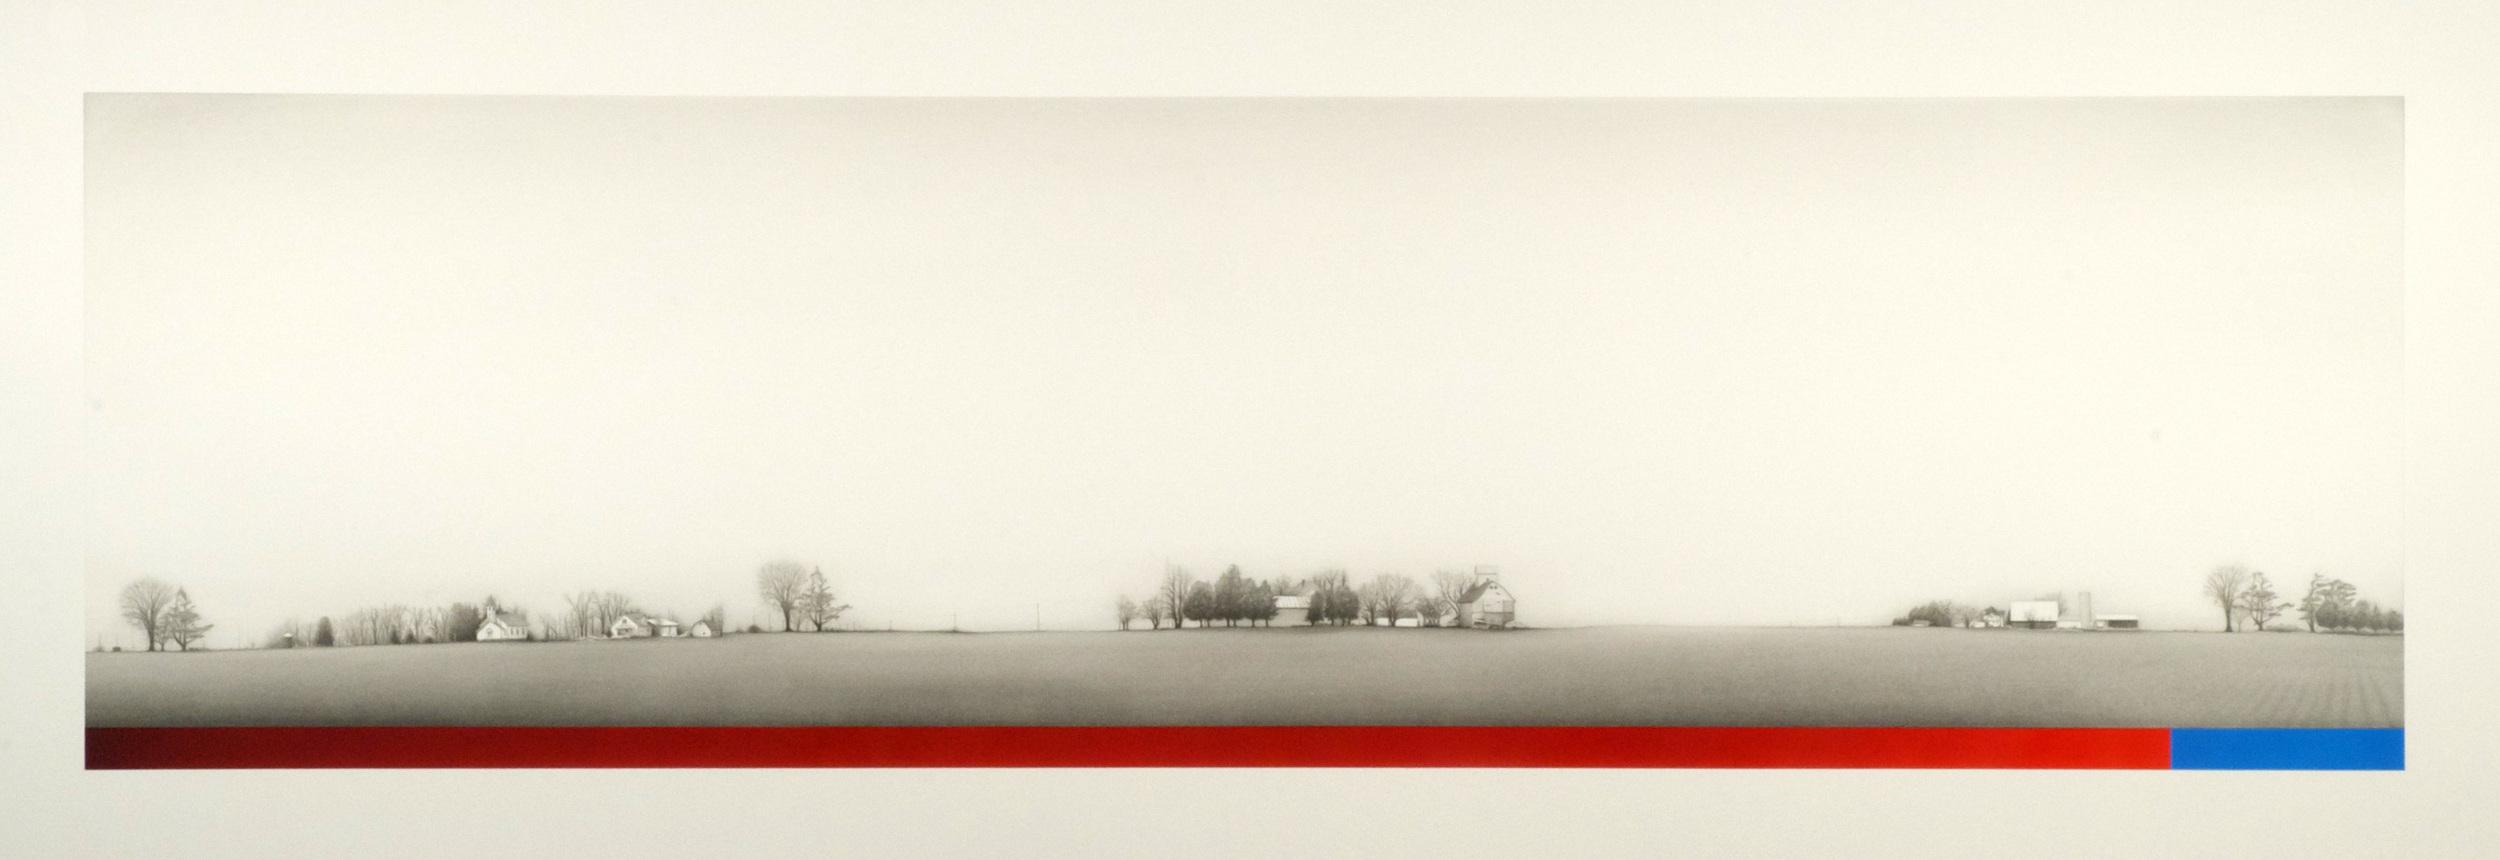 Big horizontal prairie # 3